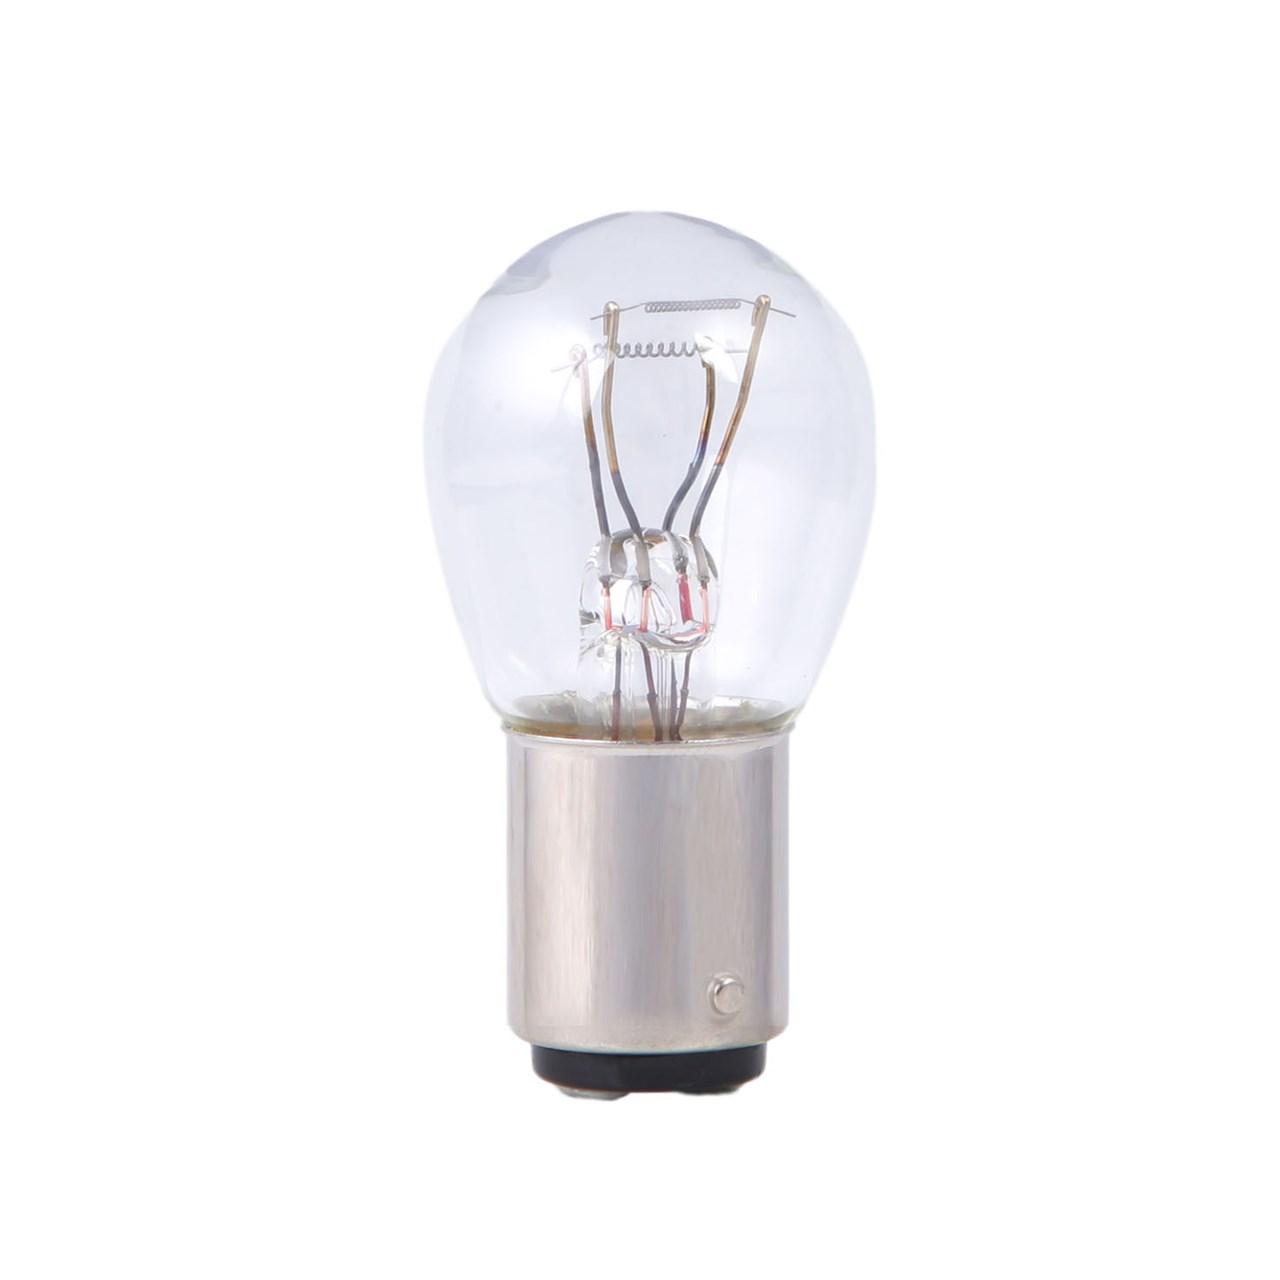 لامپ خودرو نئولوکس مدل P21/5 24V 21/5 W N334 Standard BAY15d بسته 10 عددی